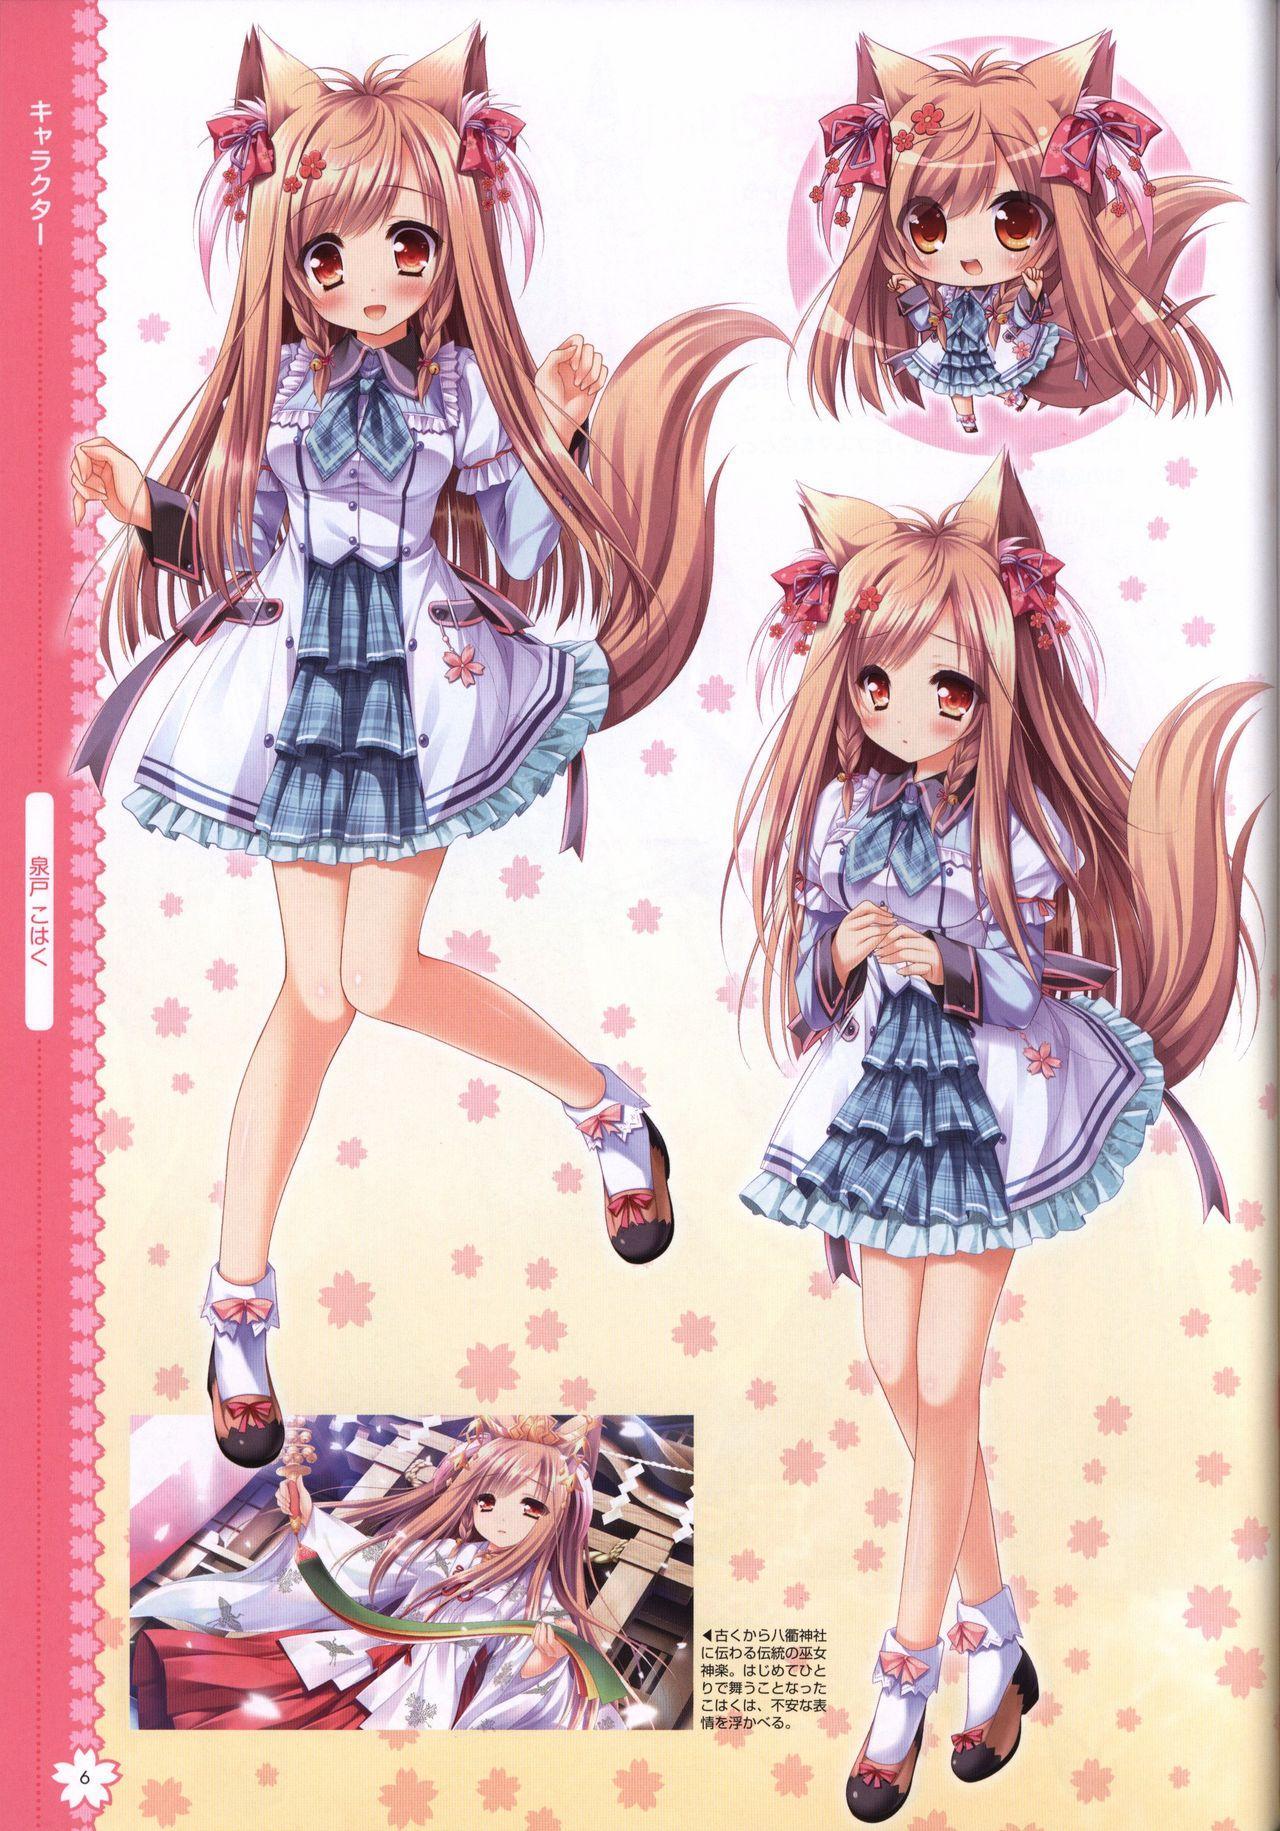 Tayutama2 Visual Art Fanbook 8